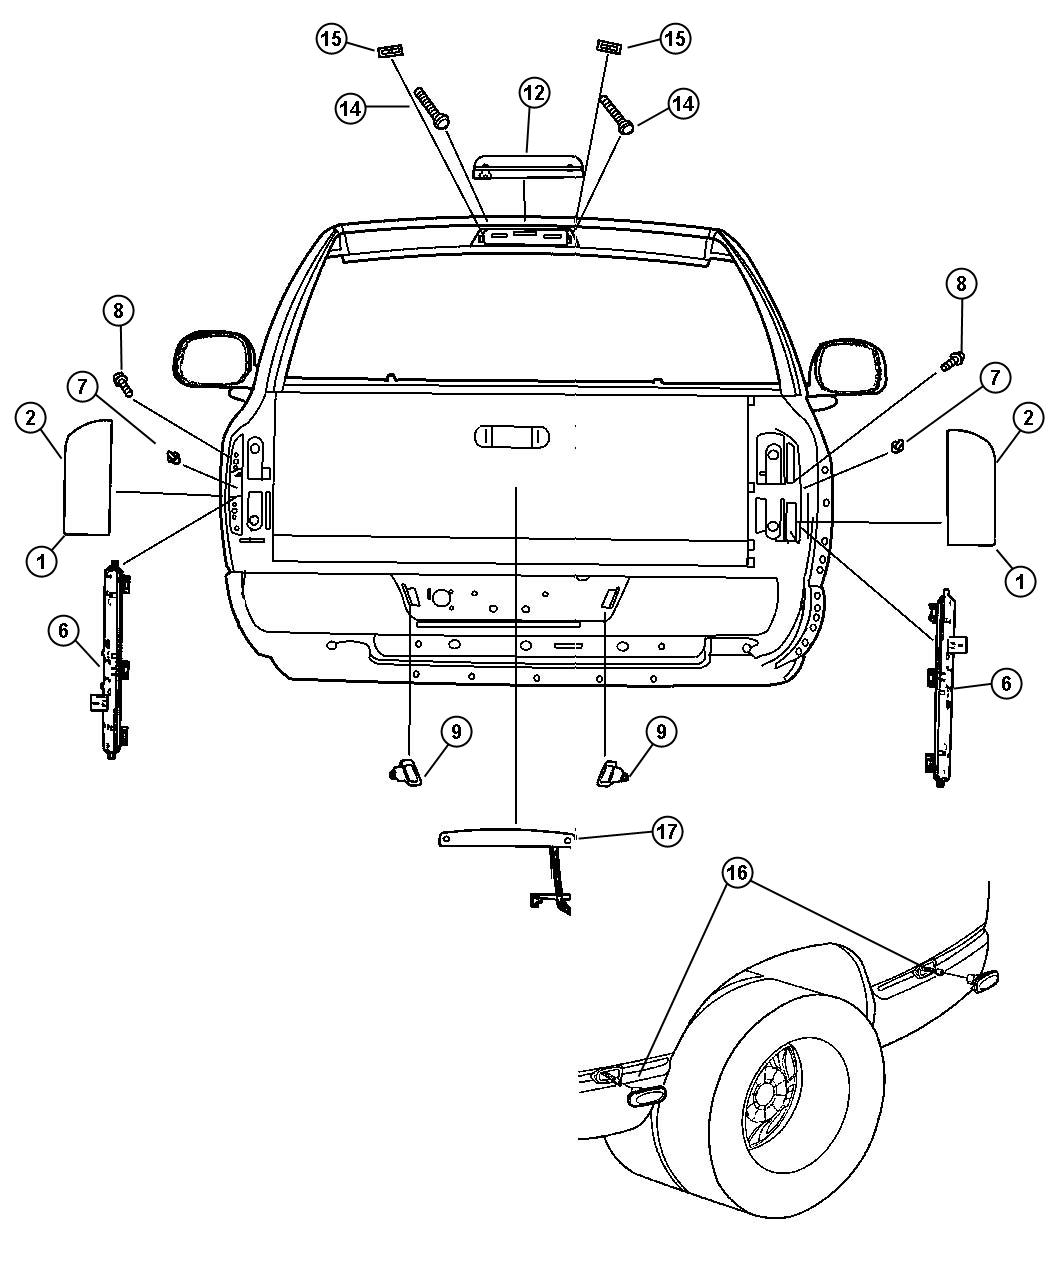 1998 dodge ram radio wiring harness